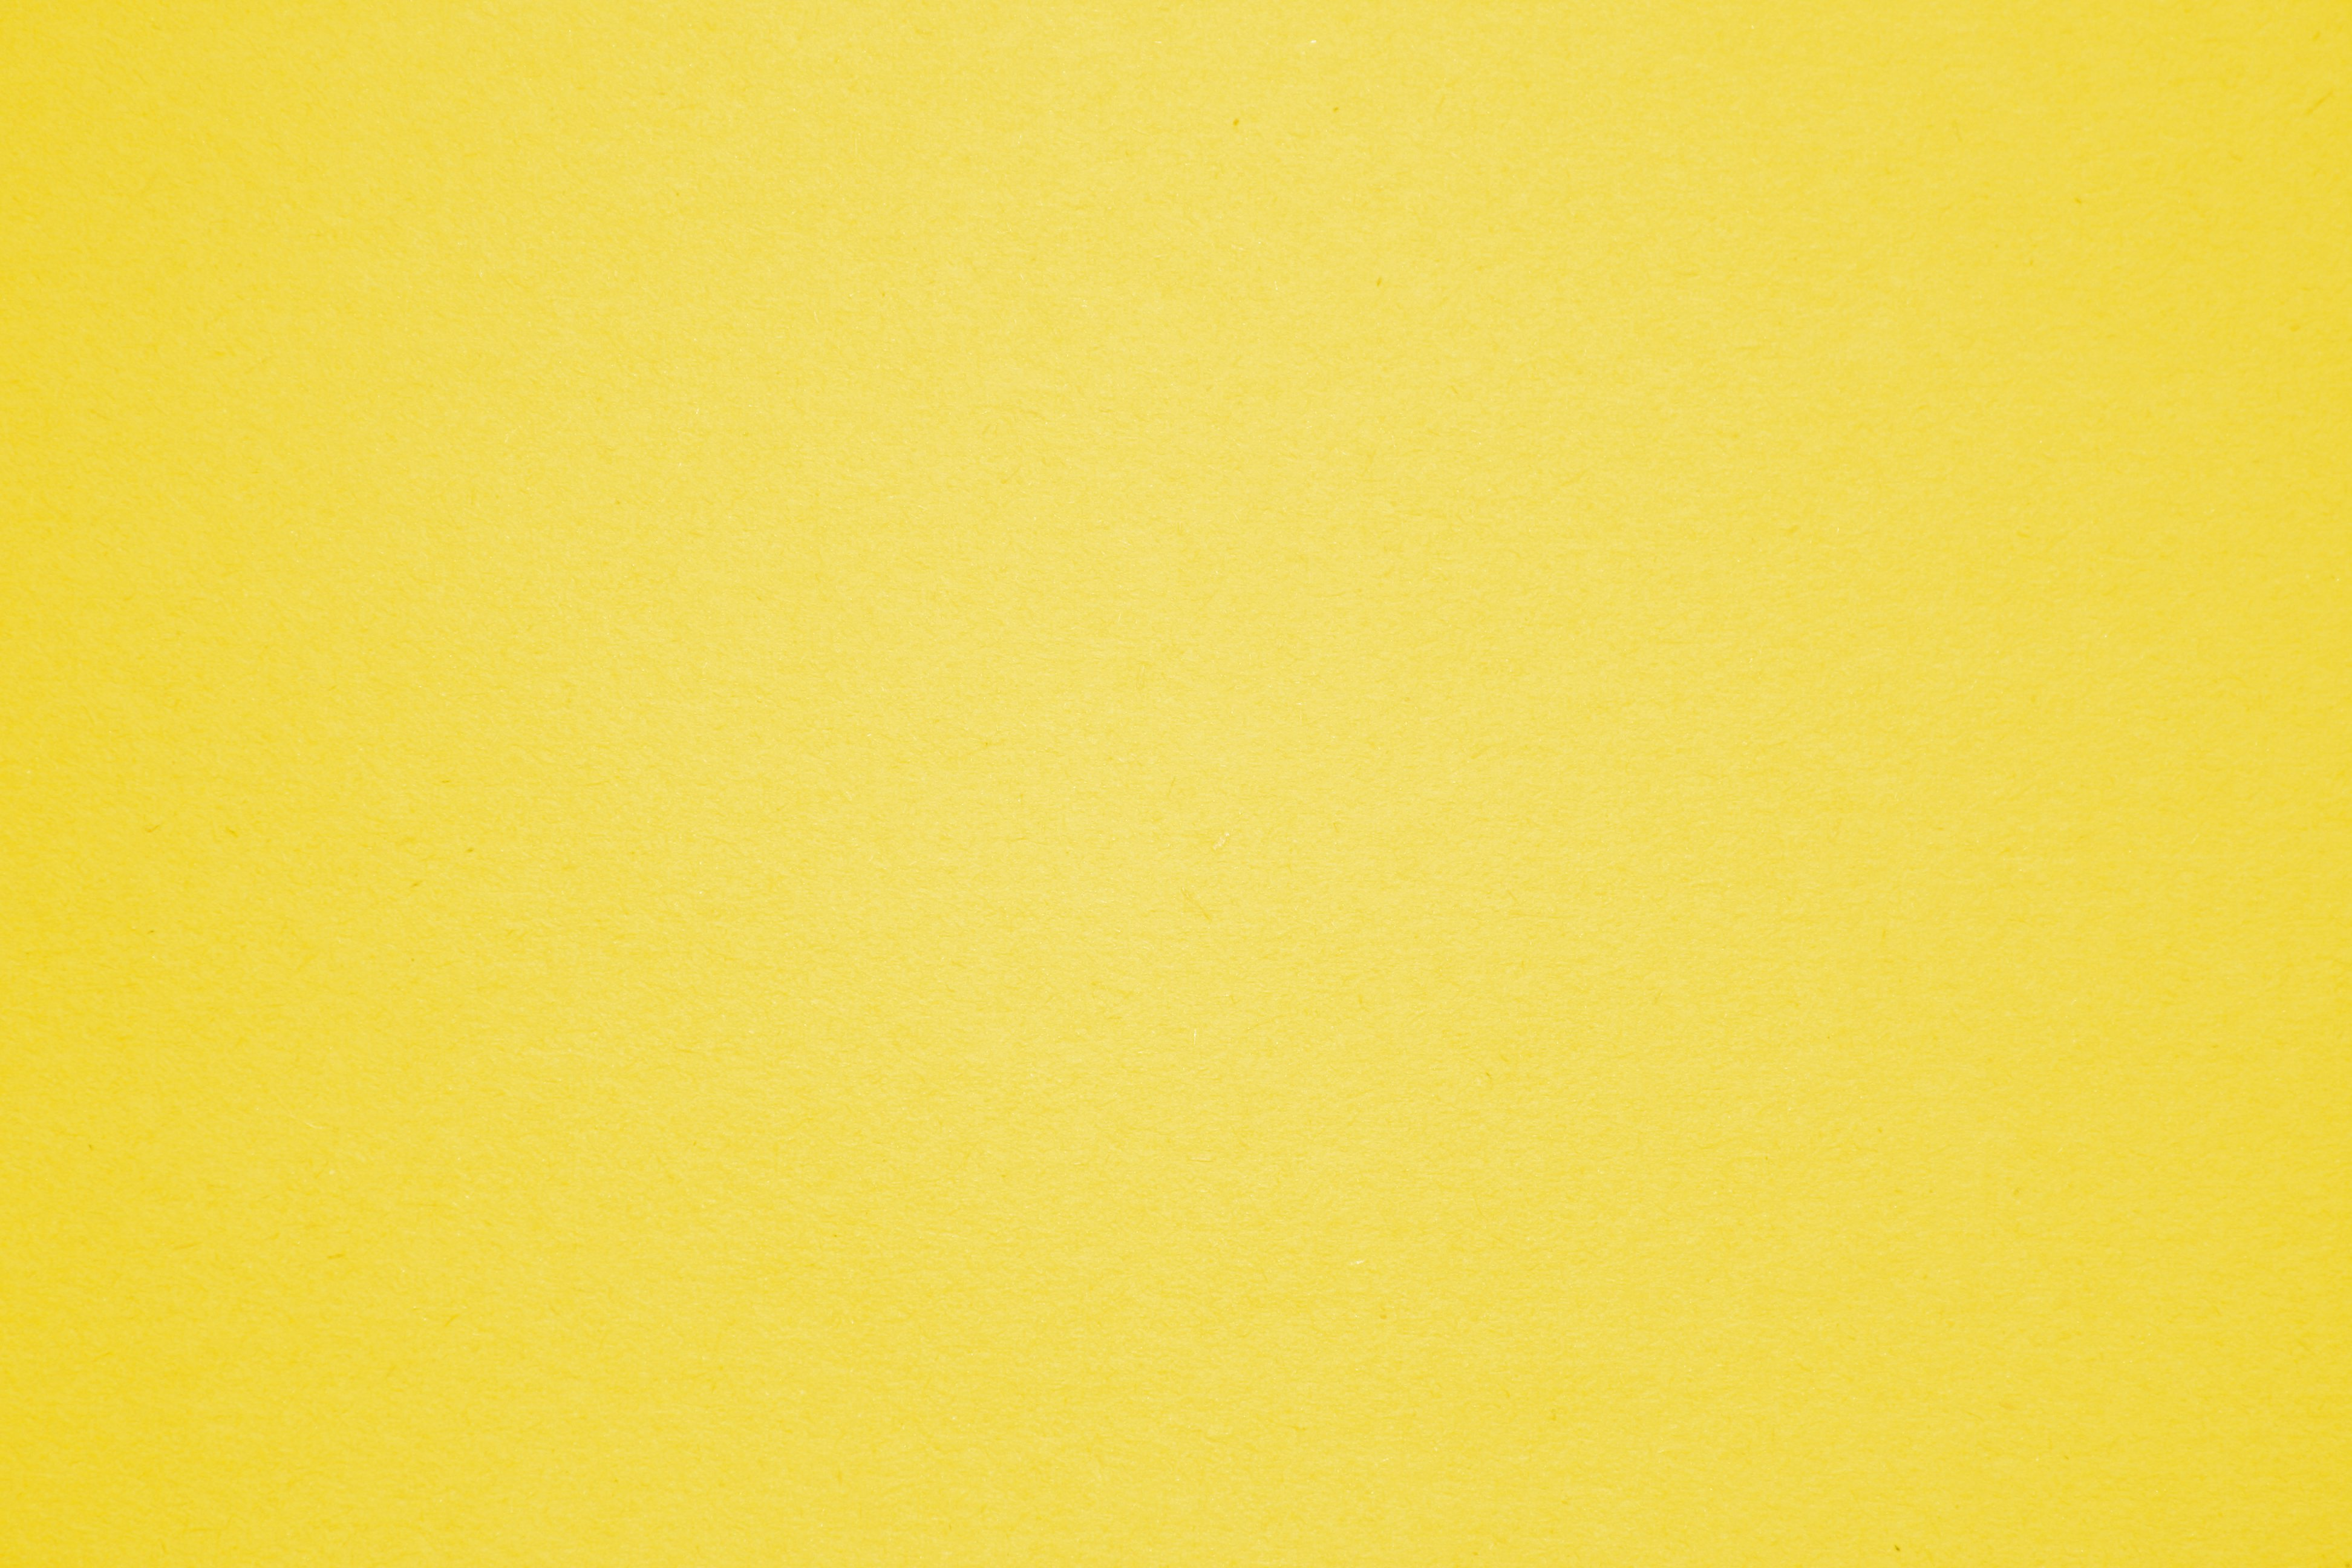 yellow wallpaper movie wallpapersafari